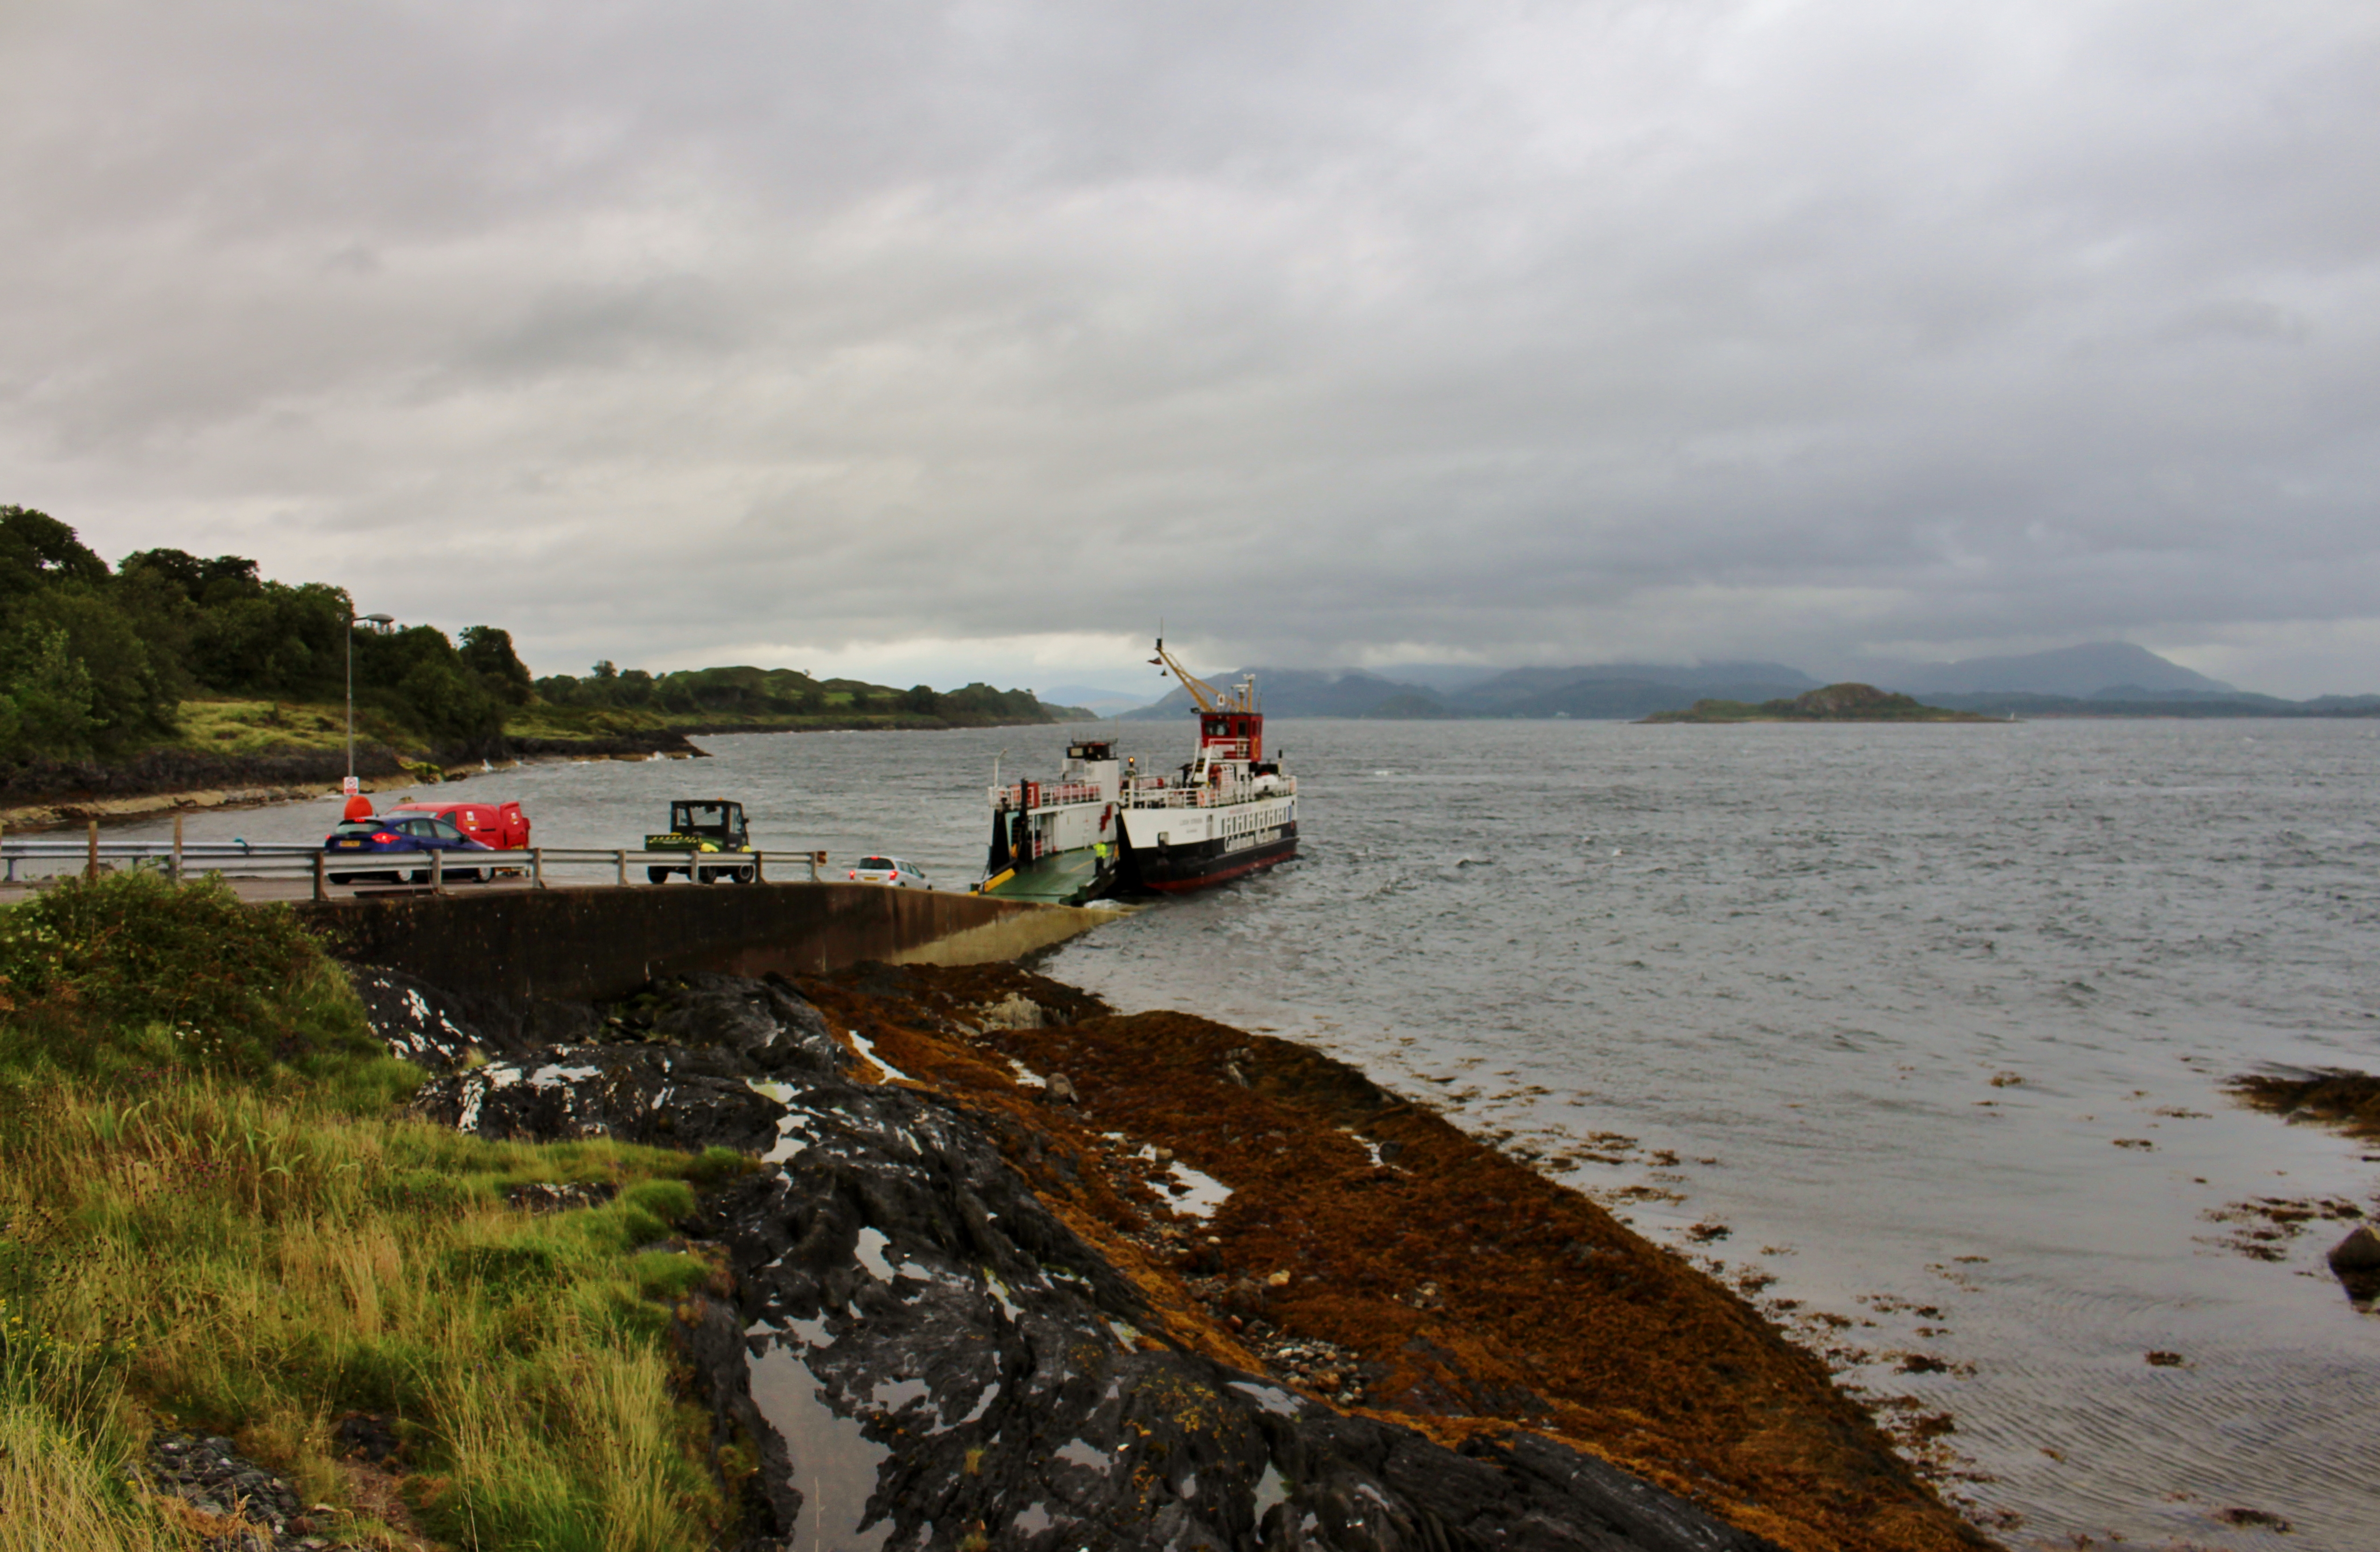 Loch Striven at Lismore (Ships of CalMac)